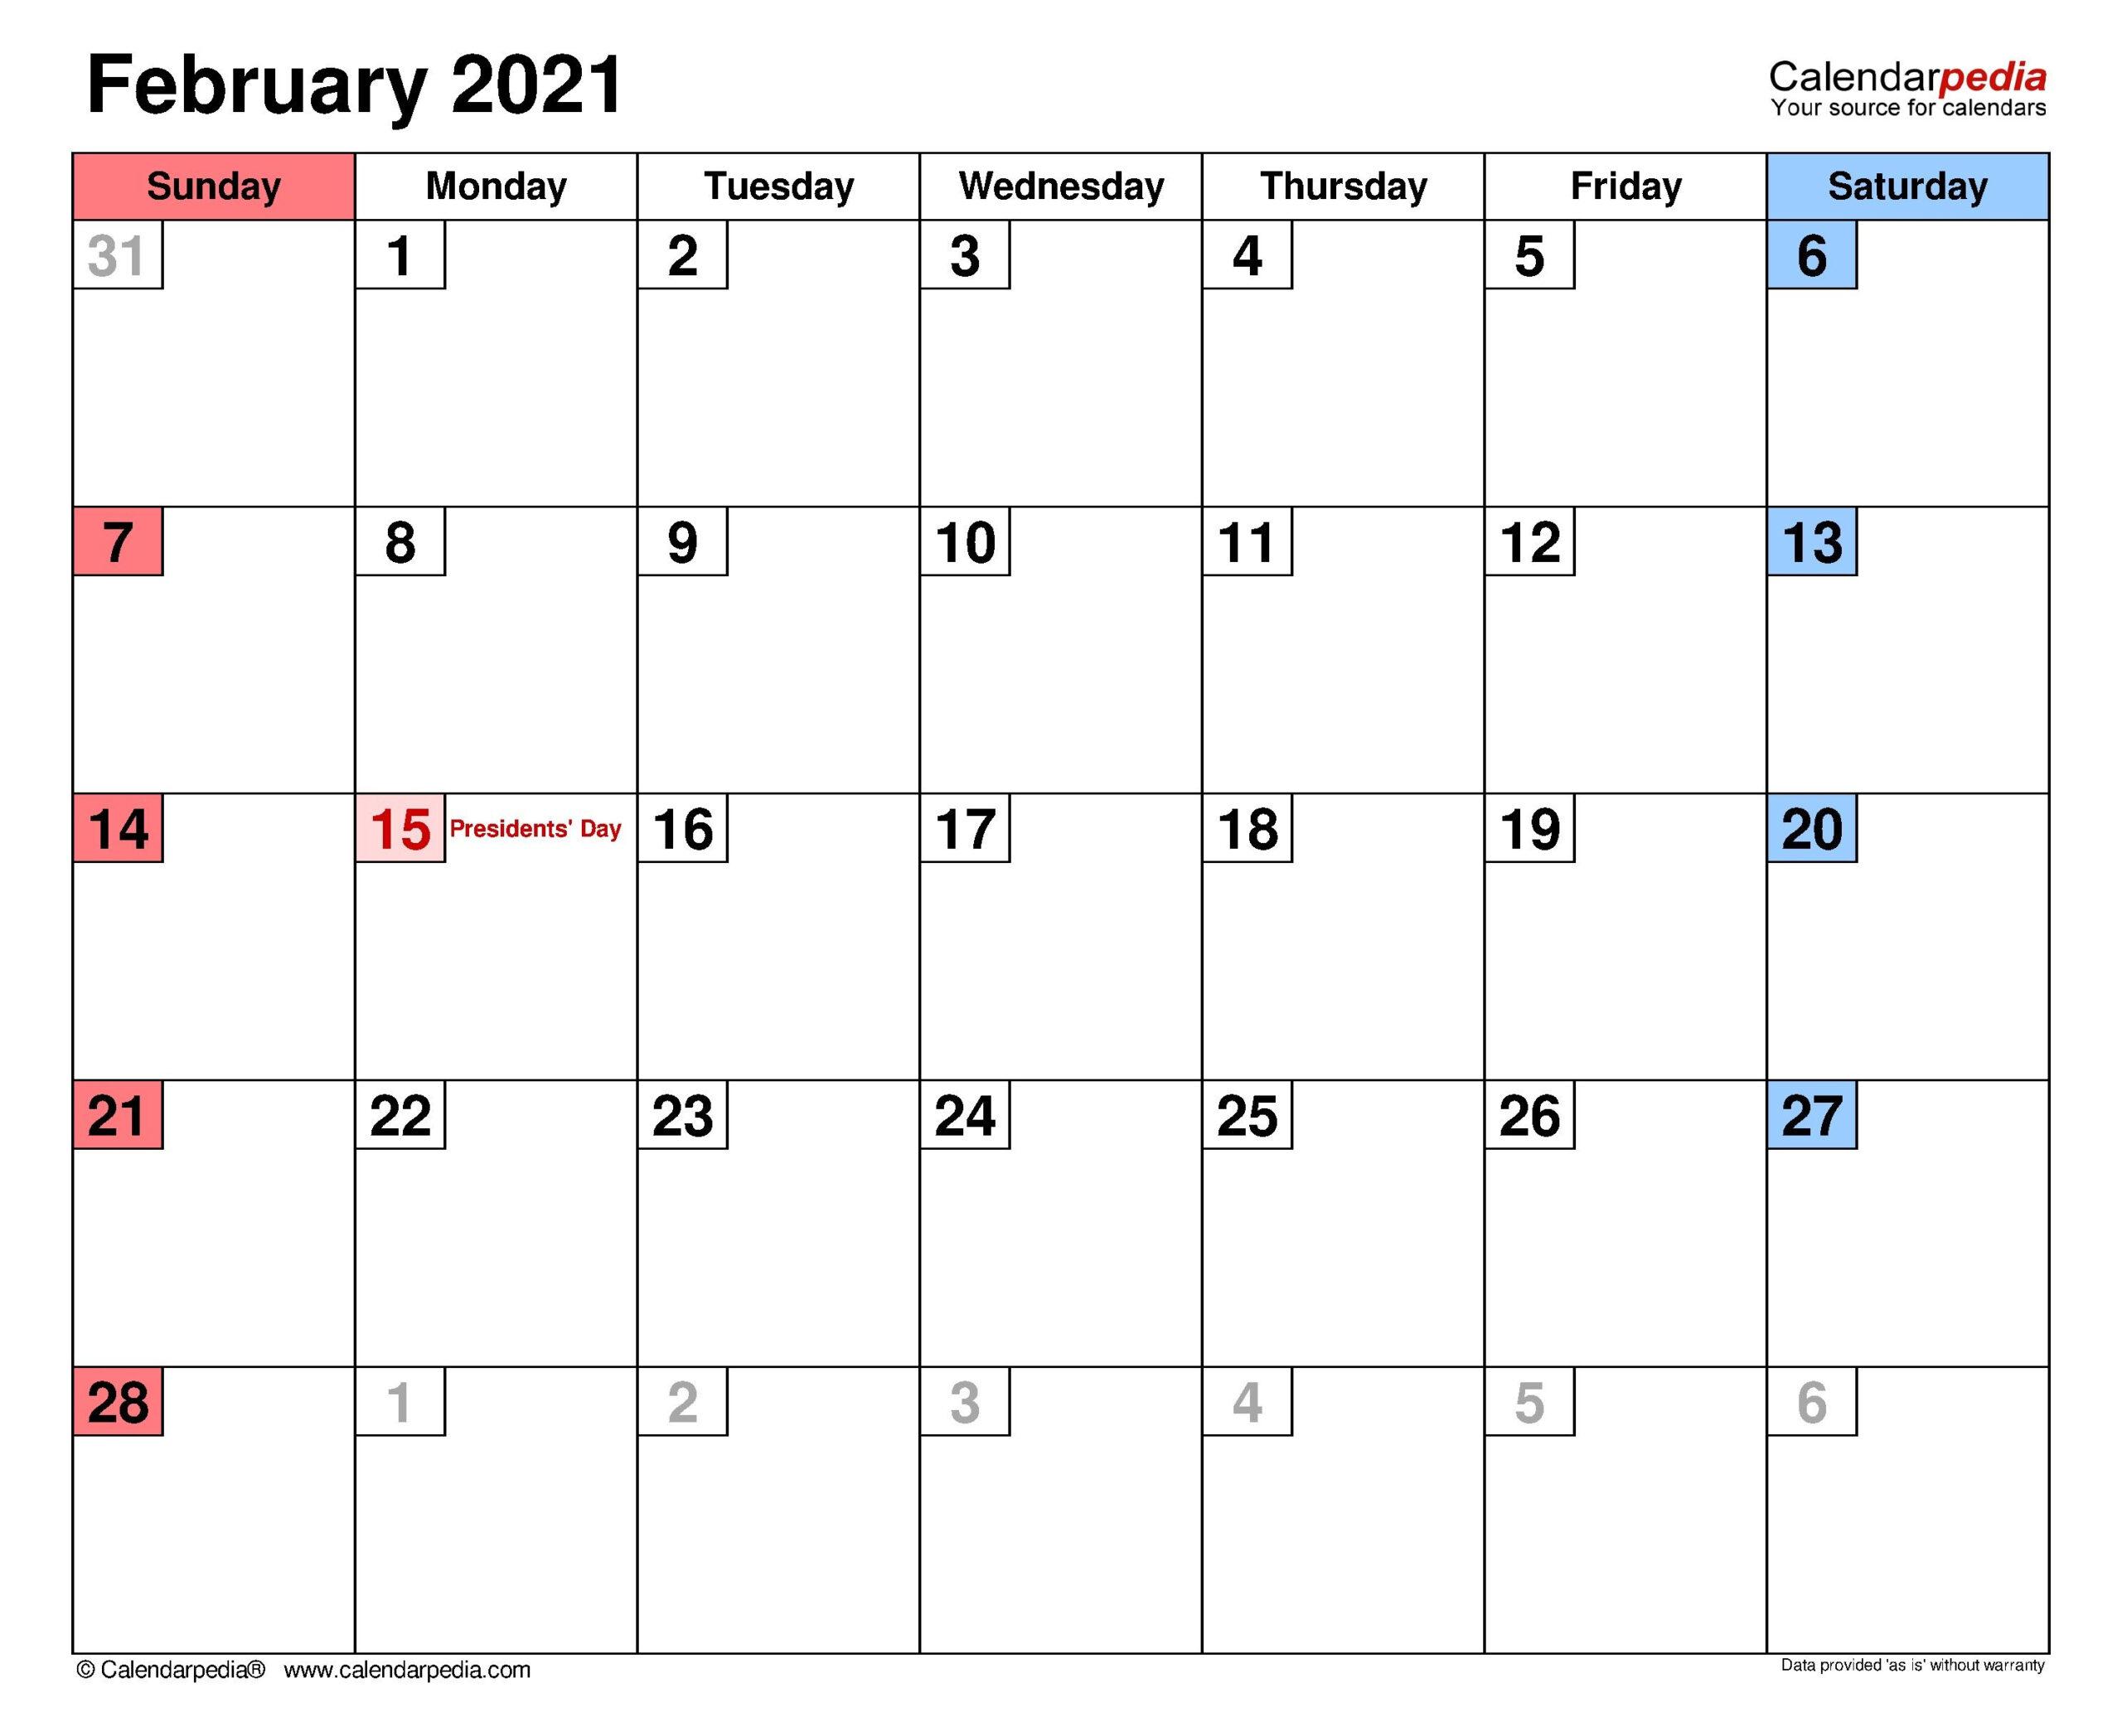 February 2021 Calendar With Canada Flag